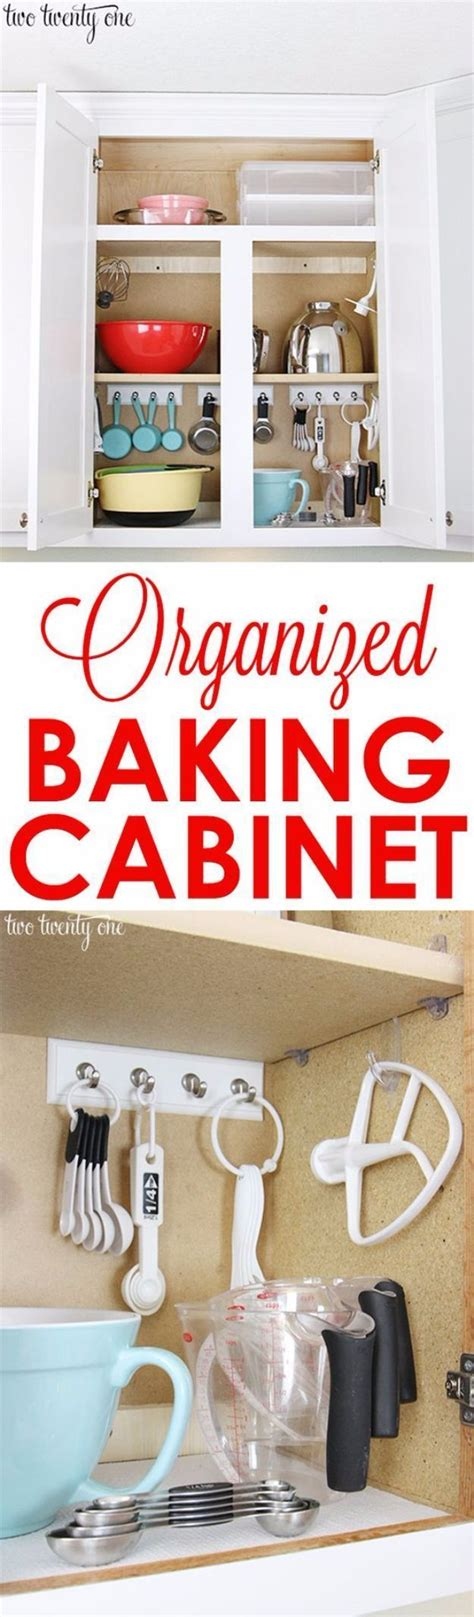 kitchen office organization ideas best 25 kitchen desk organization ideas on 5425